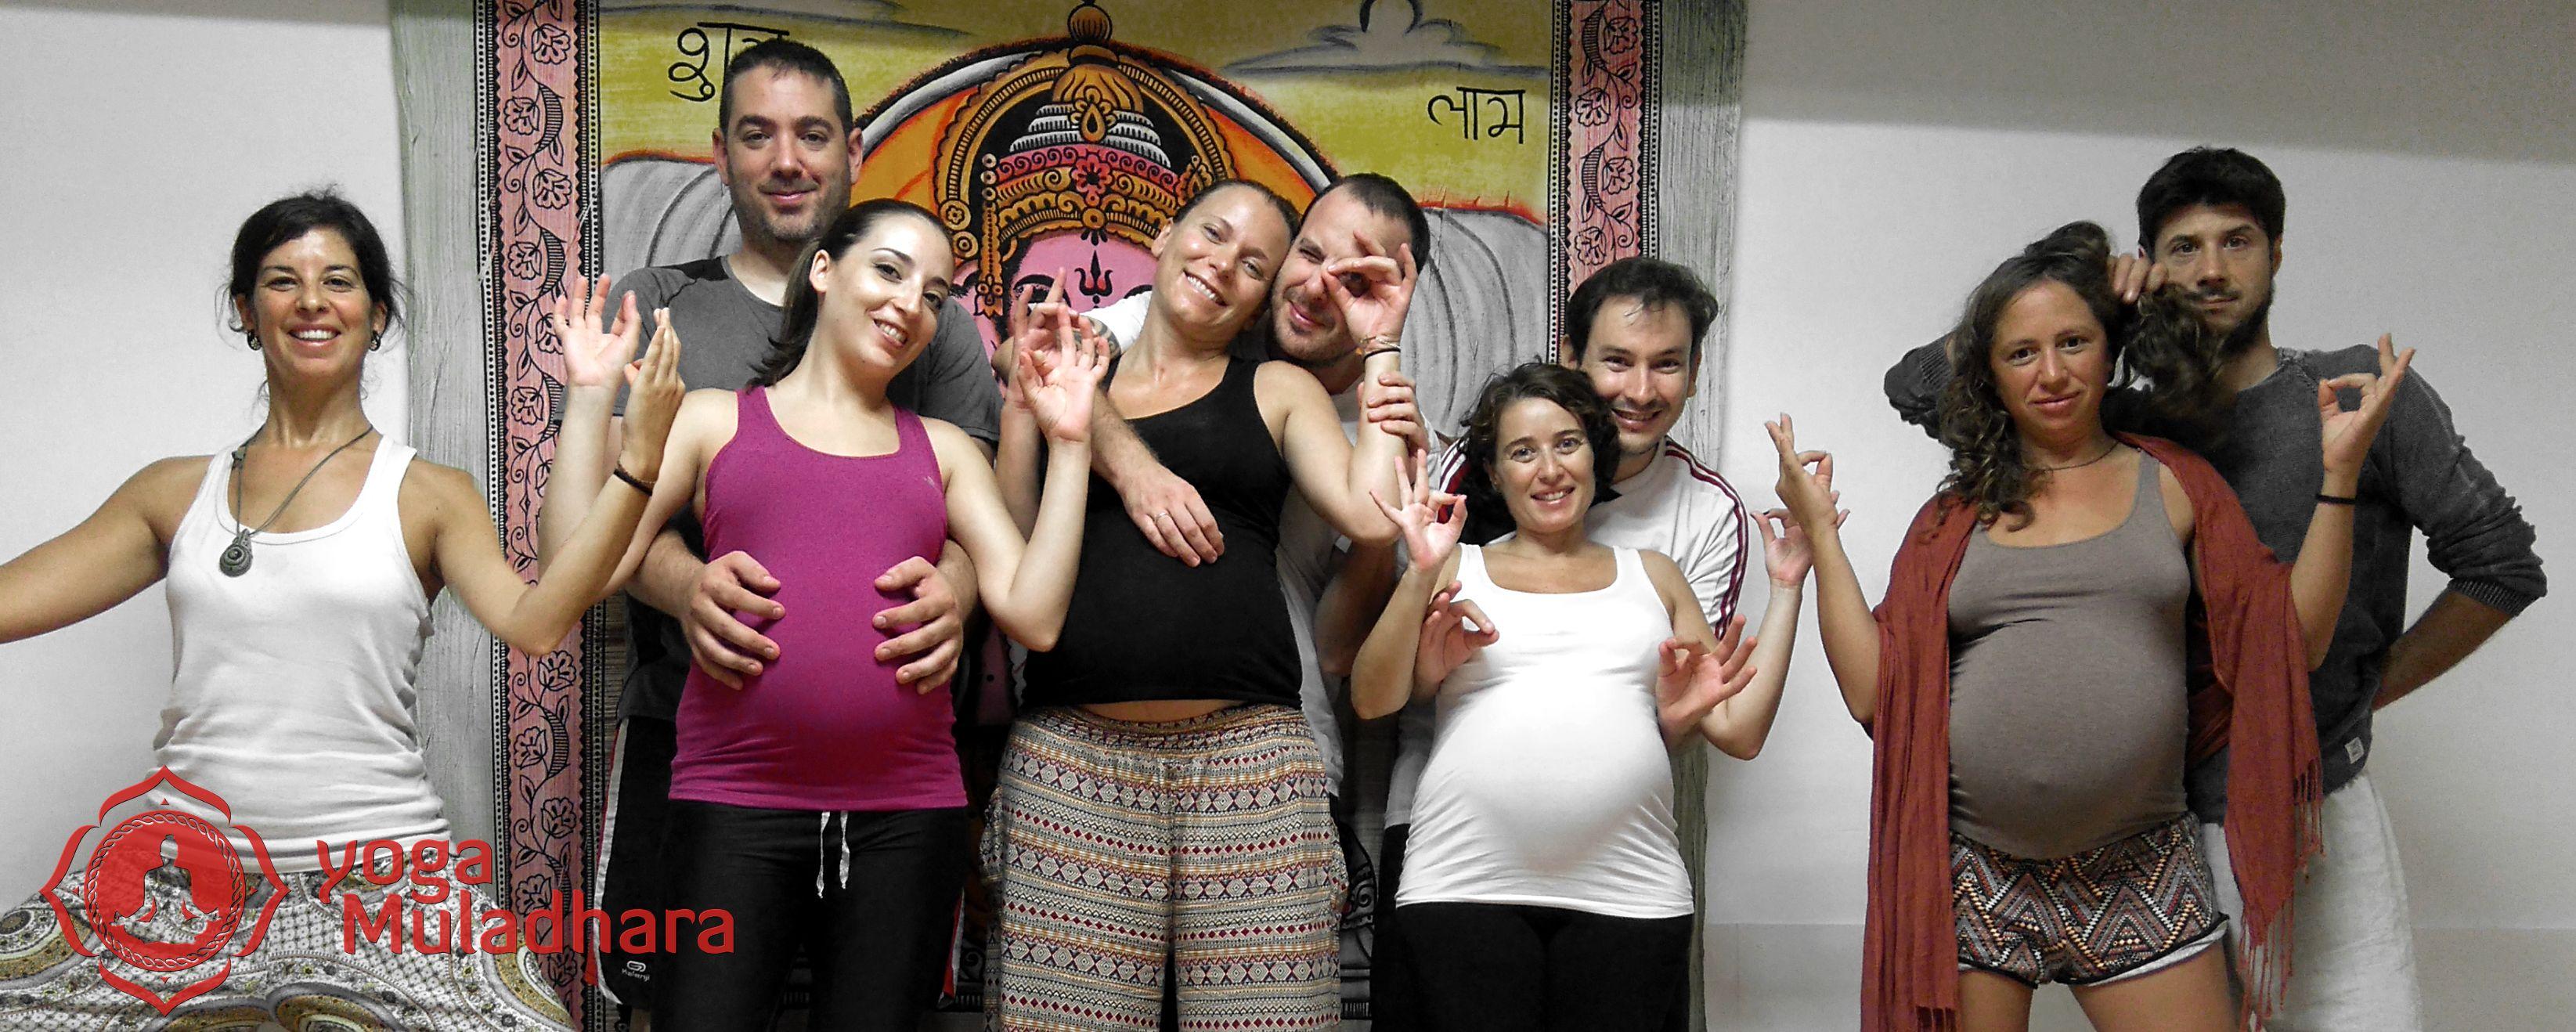 Embarazo en Pareja